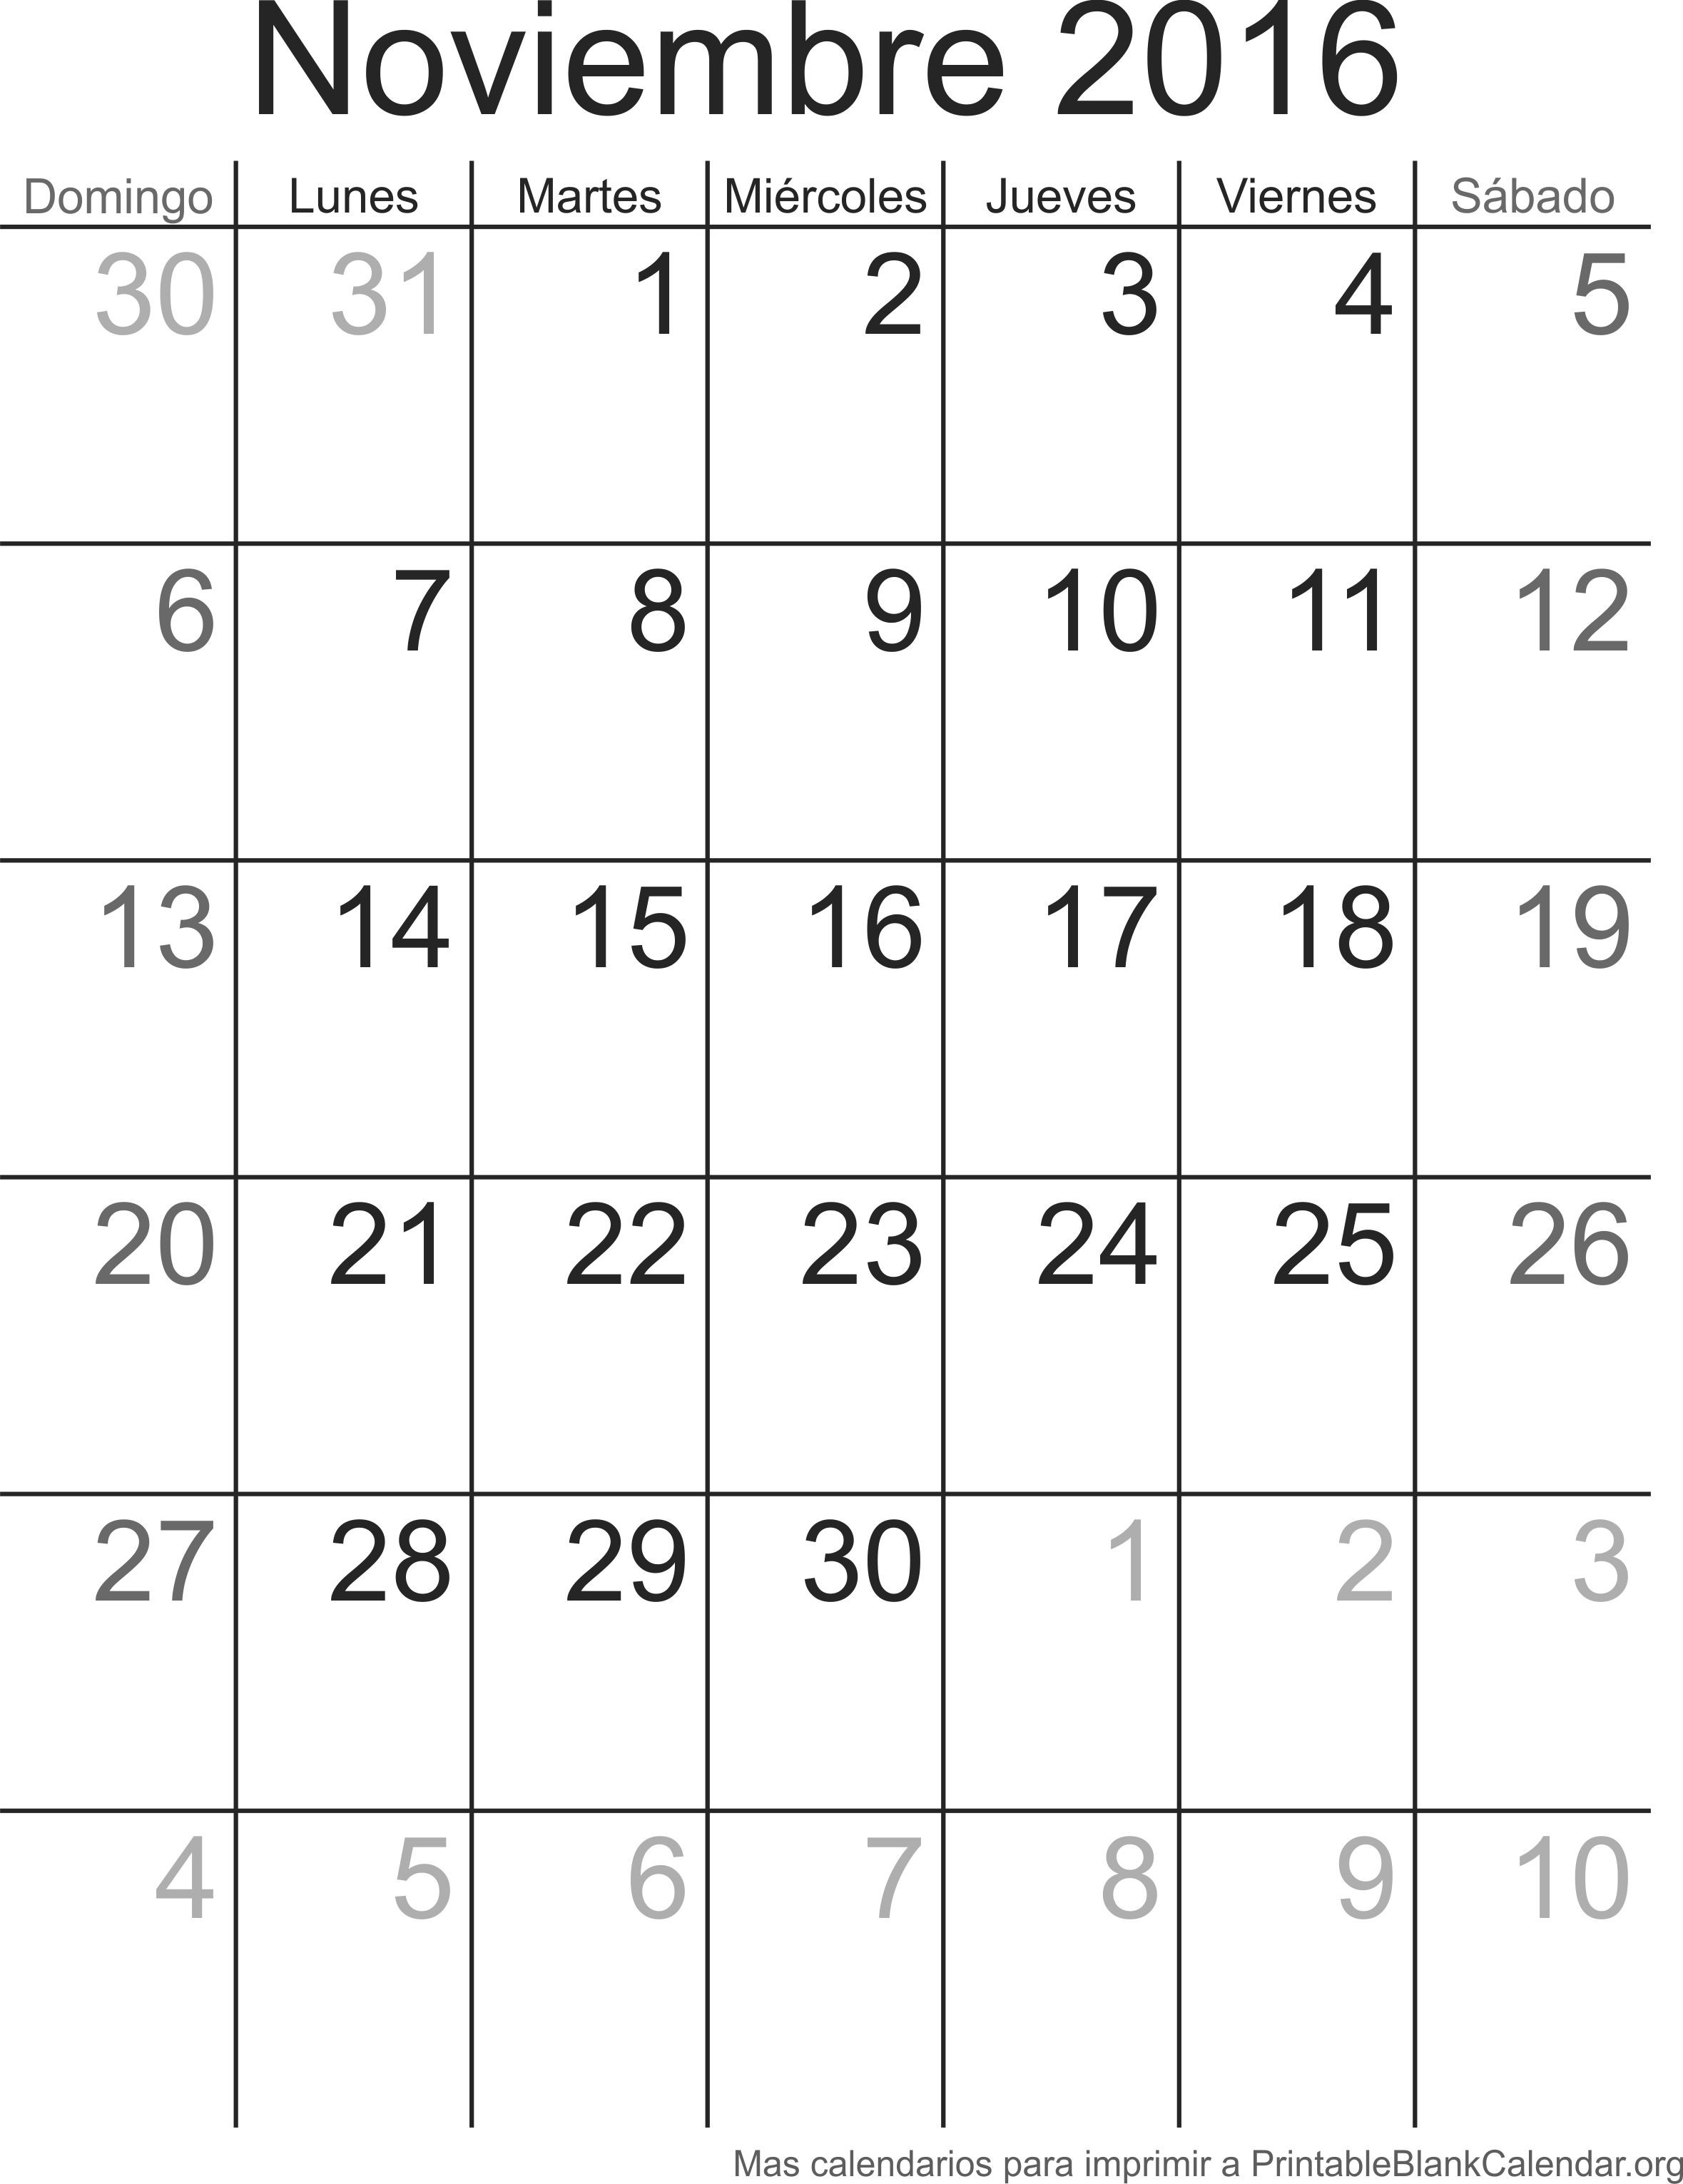 calendario para imprimir noviembre 2016